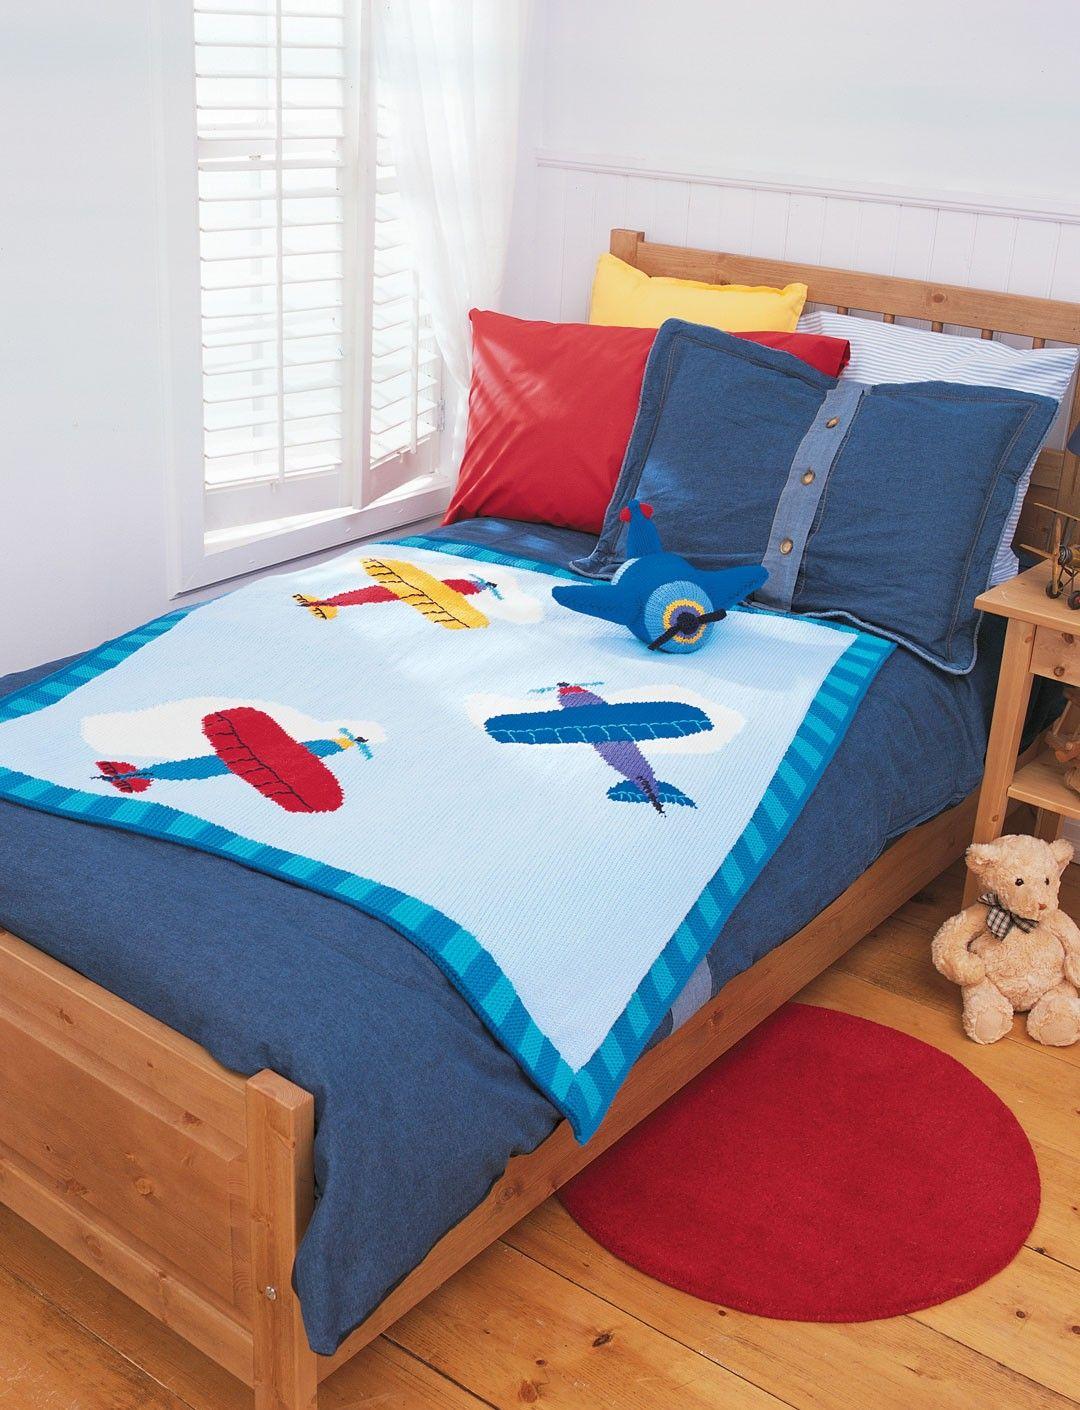 Yarnspirations.com - Patons Airplane Blanket - Patterns ...